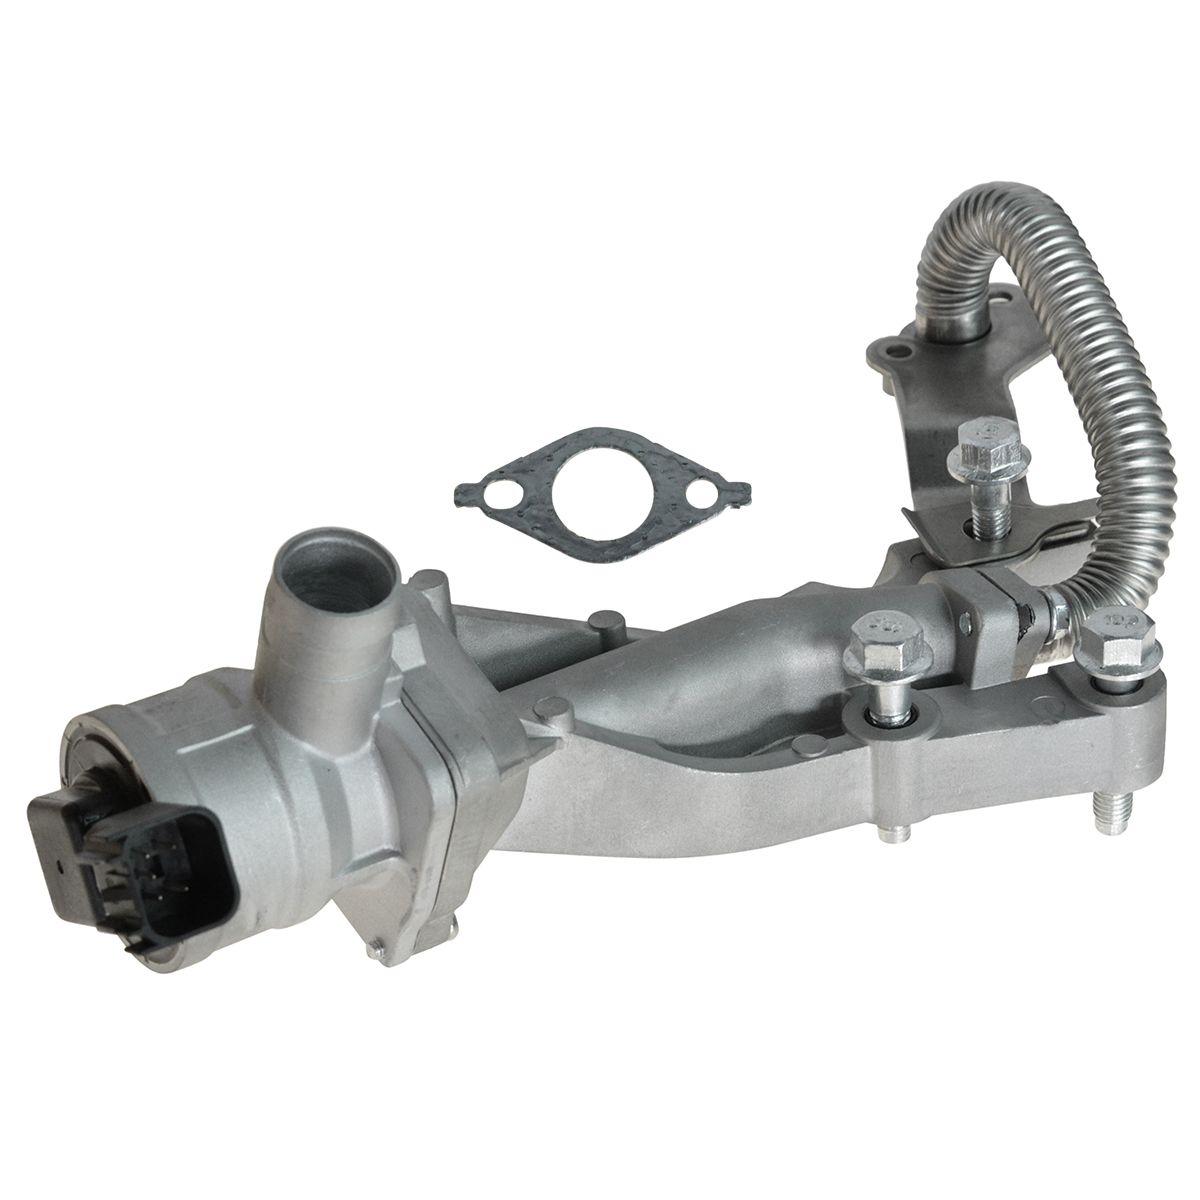 Secondary Air Injection Check Valve Dorman 911-153